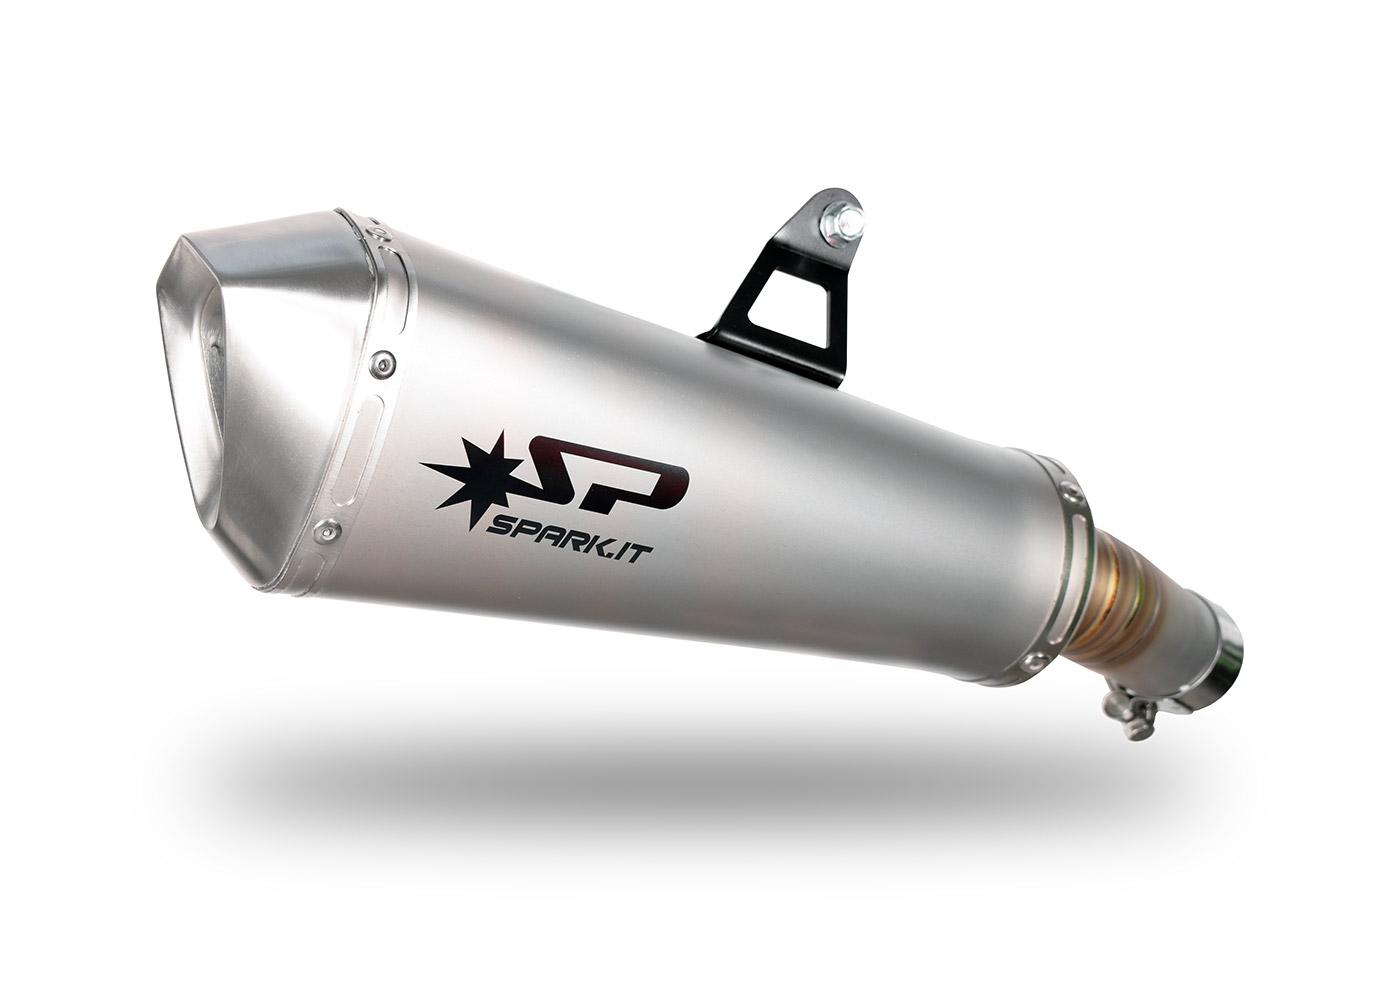 Silenziatore GKA8824 per kawasaki NINJA 400 (18-19) | SPARK Exhaust